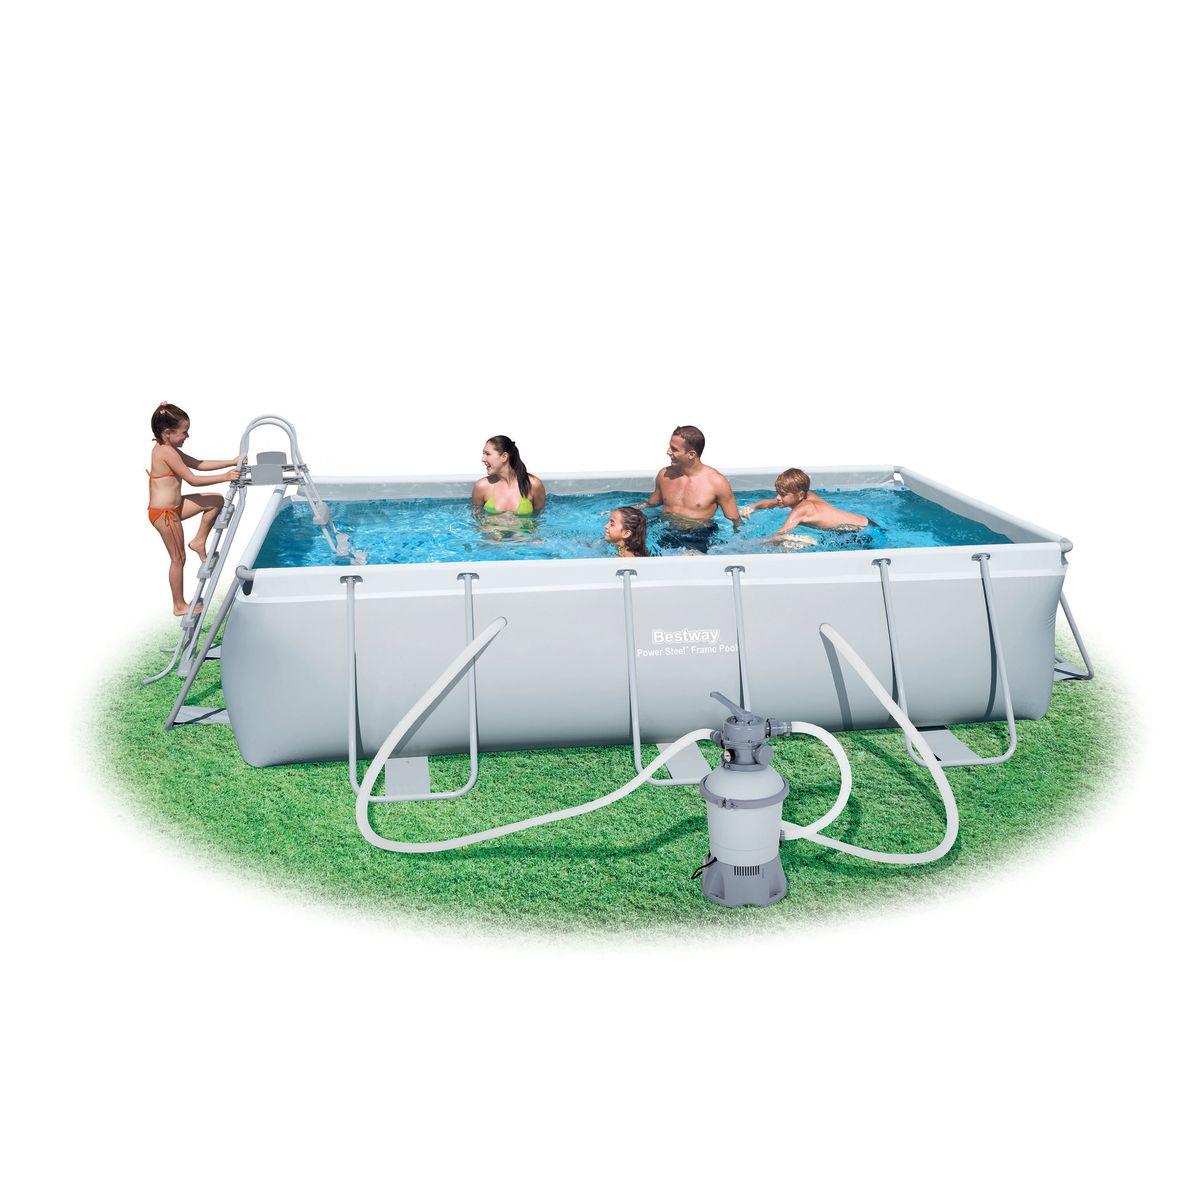 piscine da giardino ferrara bel design moderno giardino interno. Black Bedroom Furniture Sets. Home Design Ideas